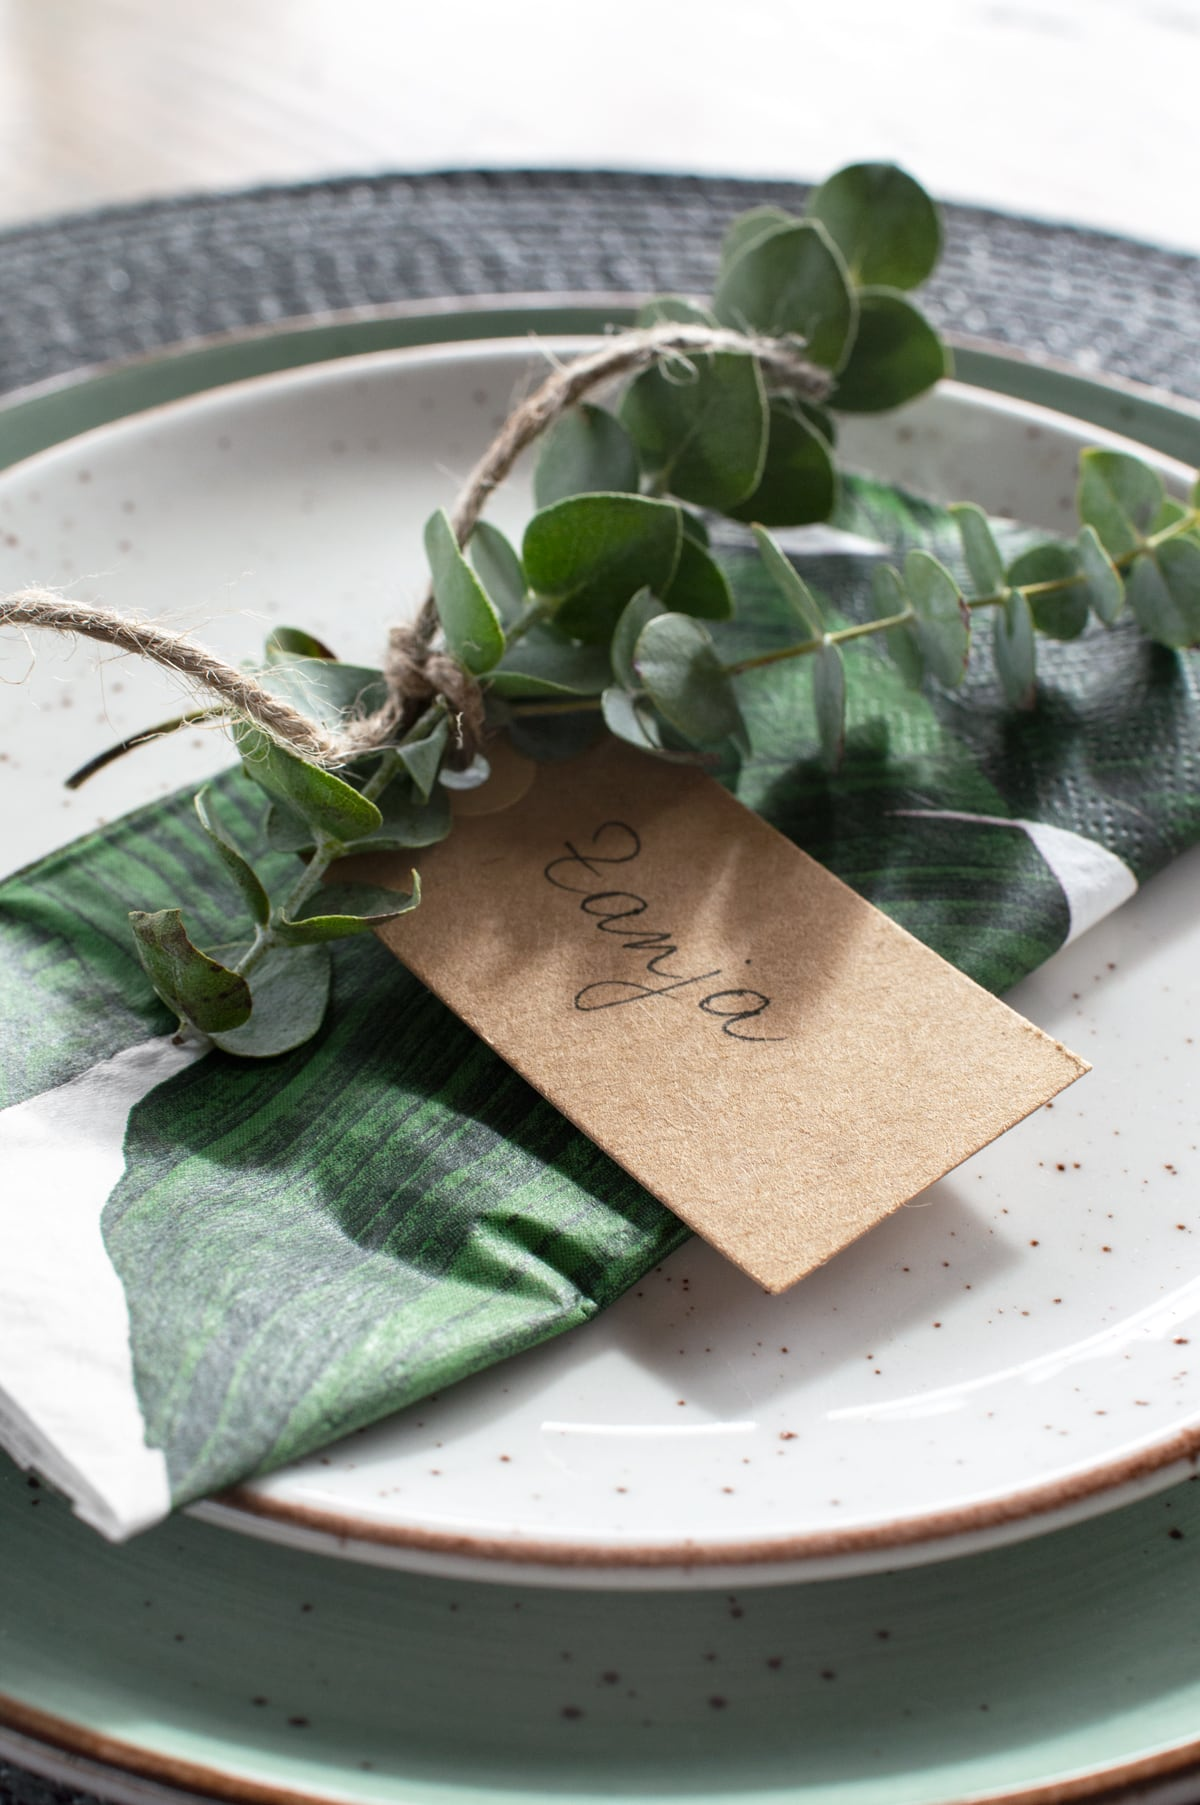 Eucalyptus naamkaartje tafelstyling - Tanja van Hoogdalem